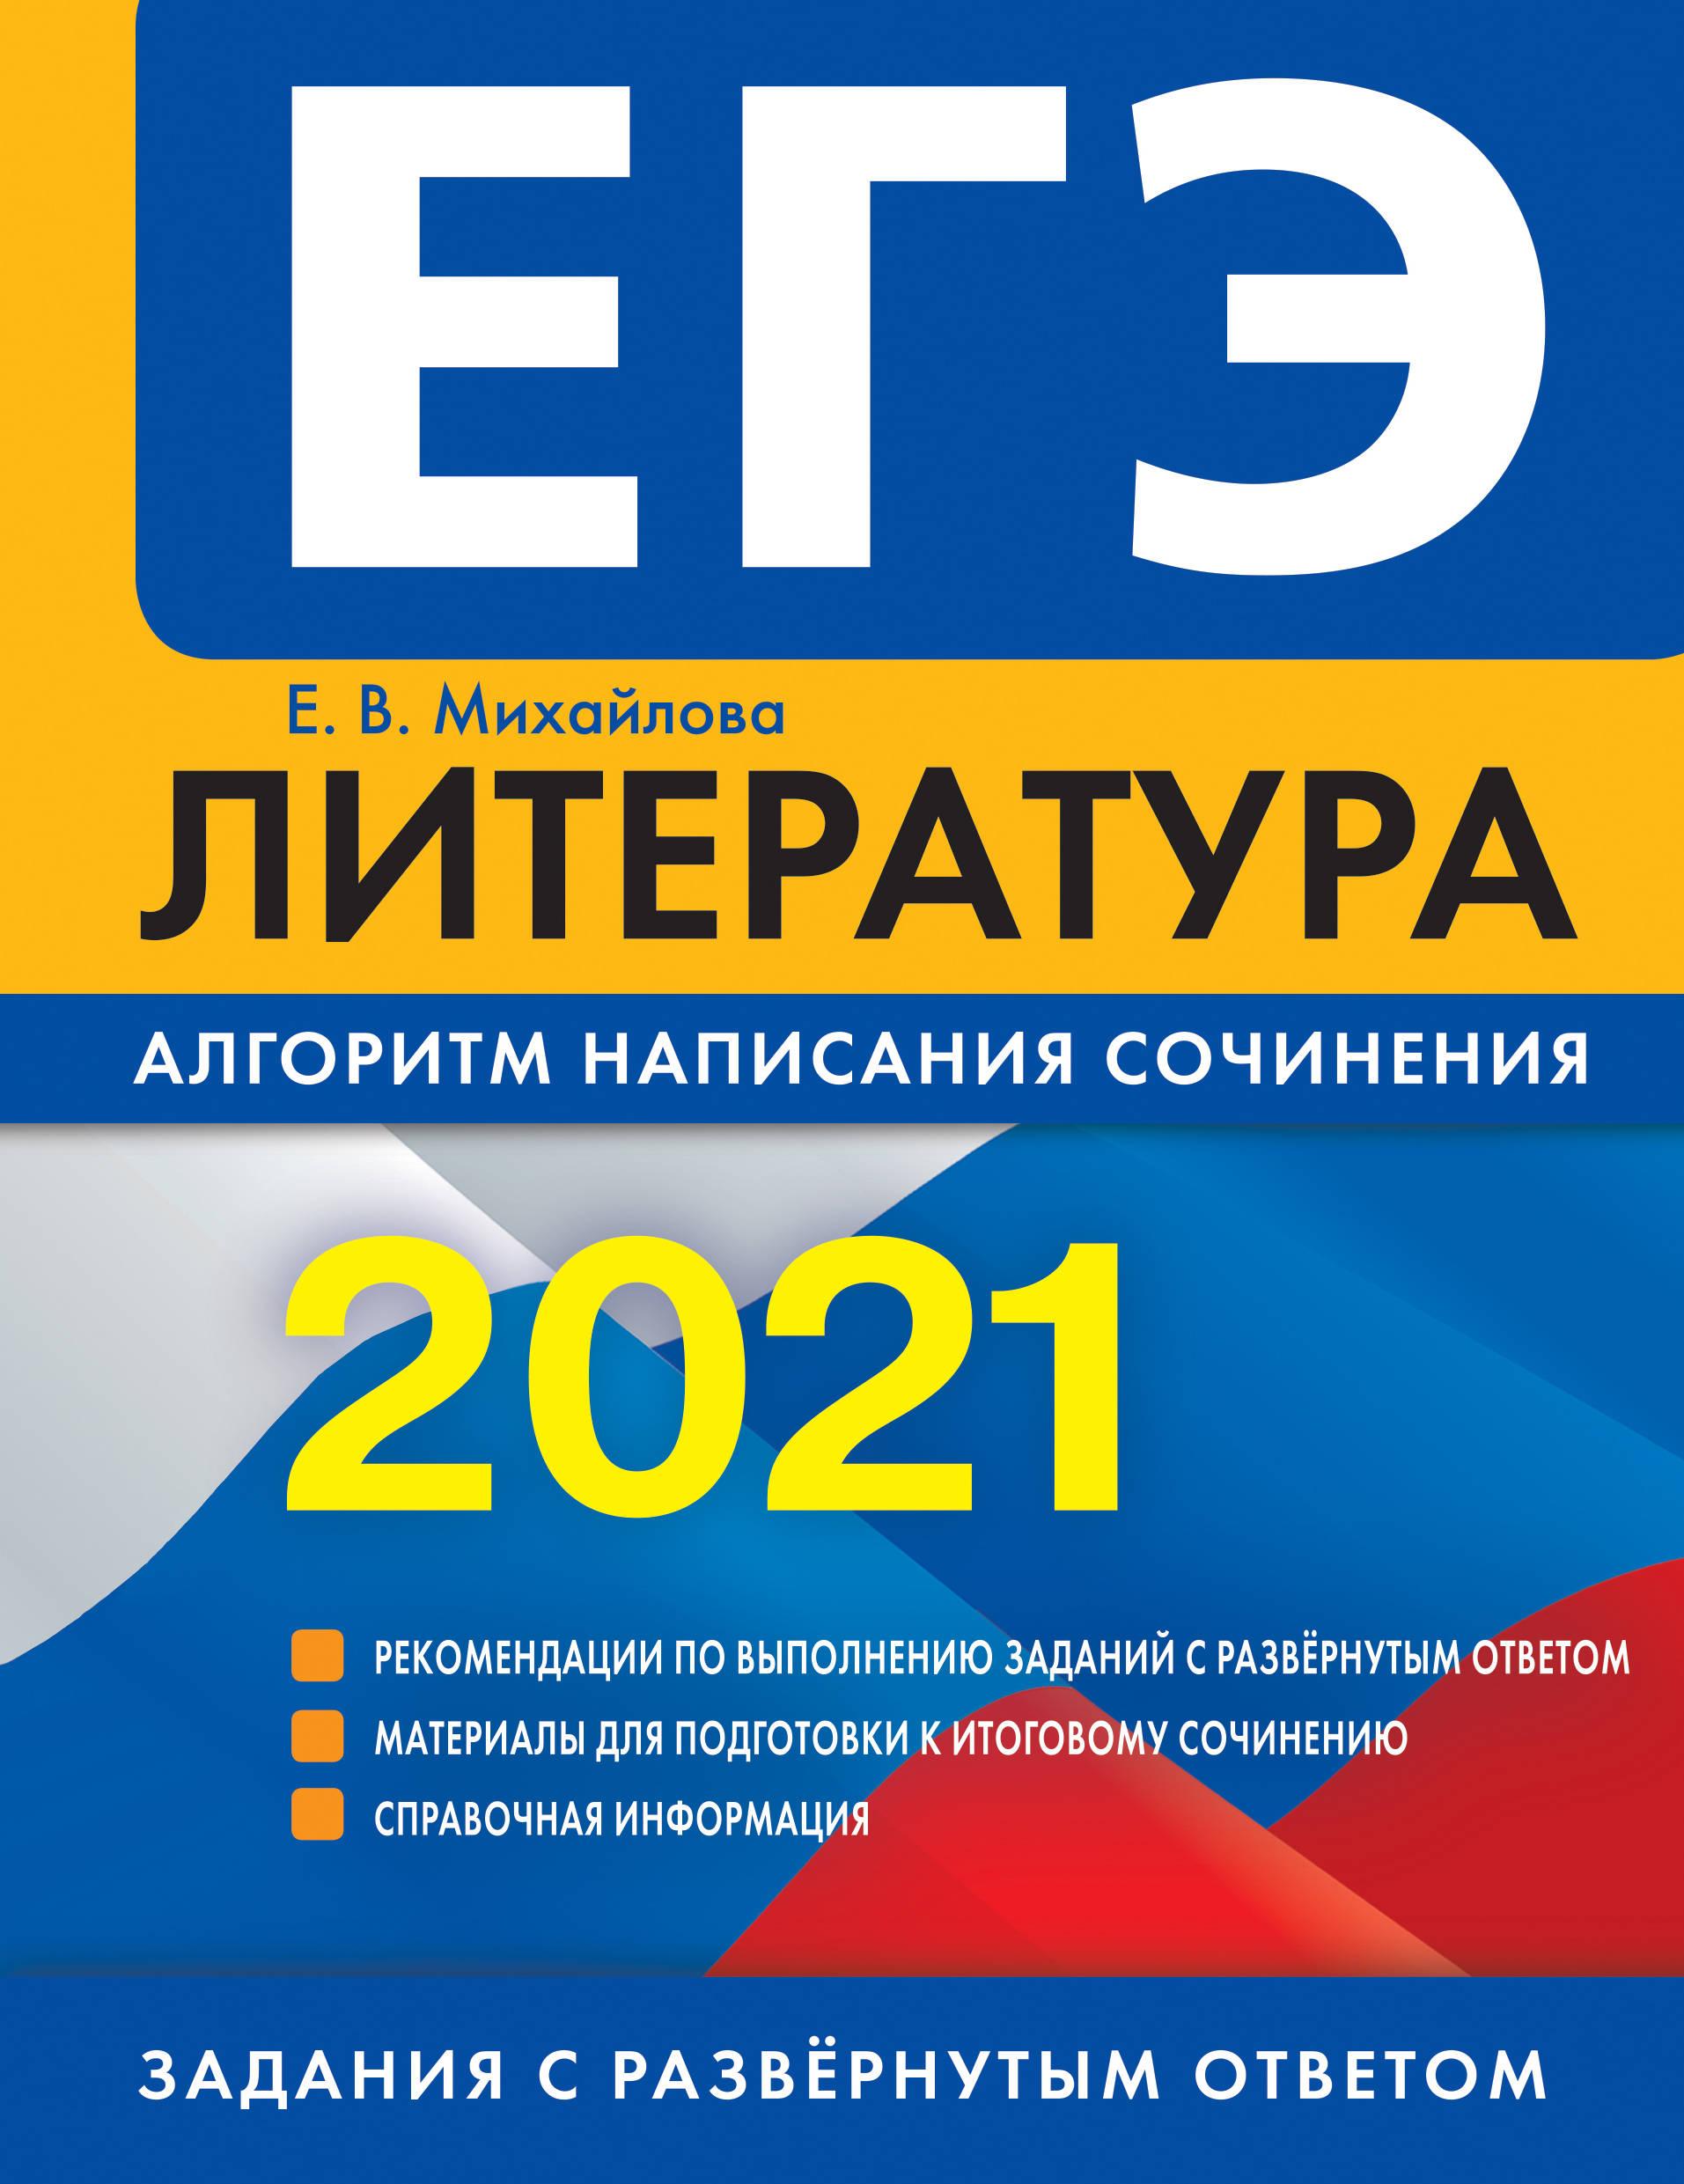 EGE-2021. Literatura. Algoritm napisanija sochinenija